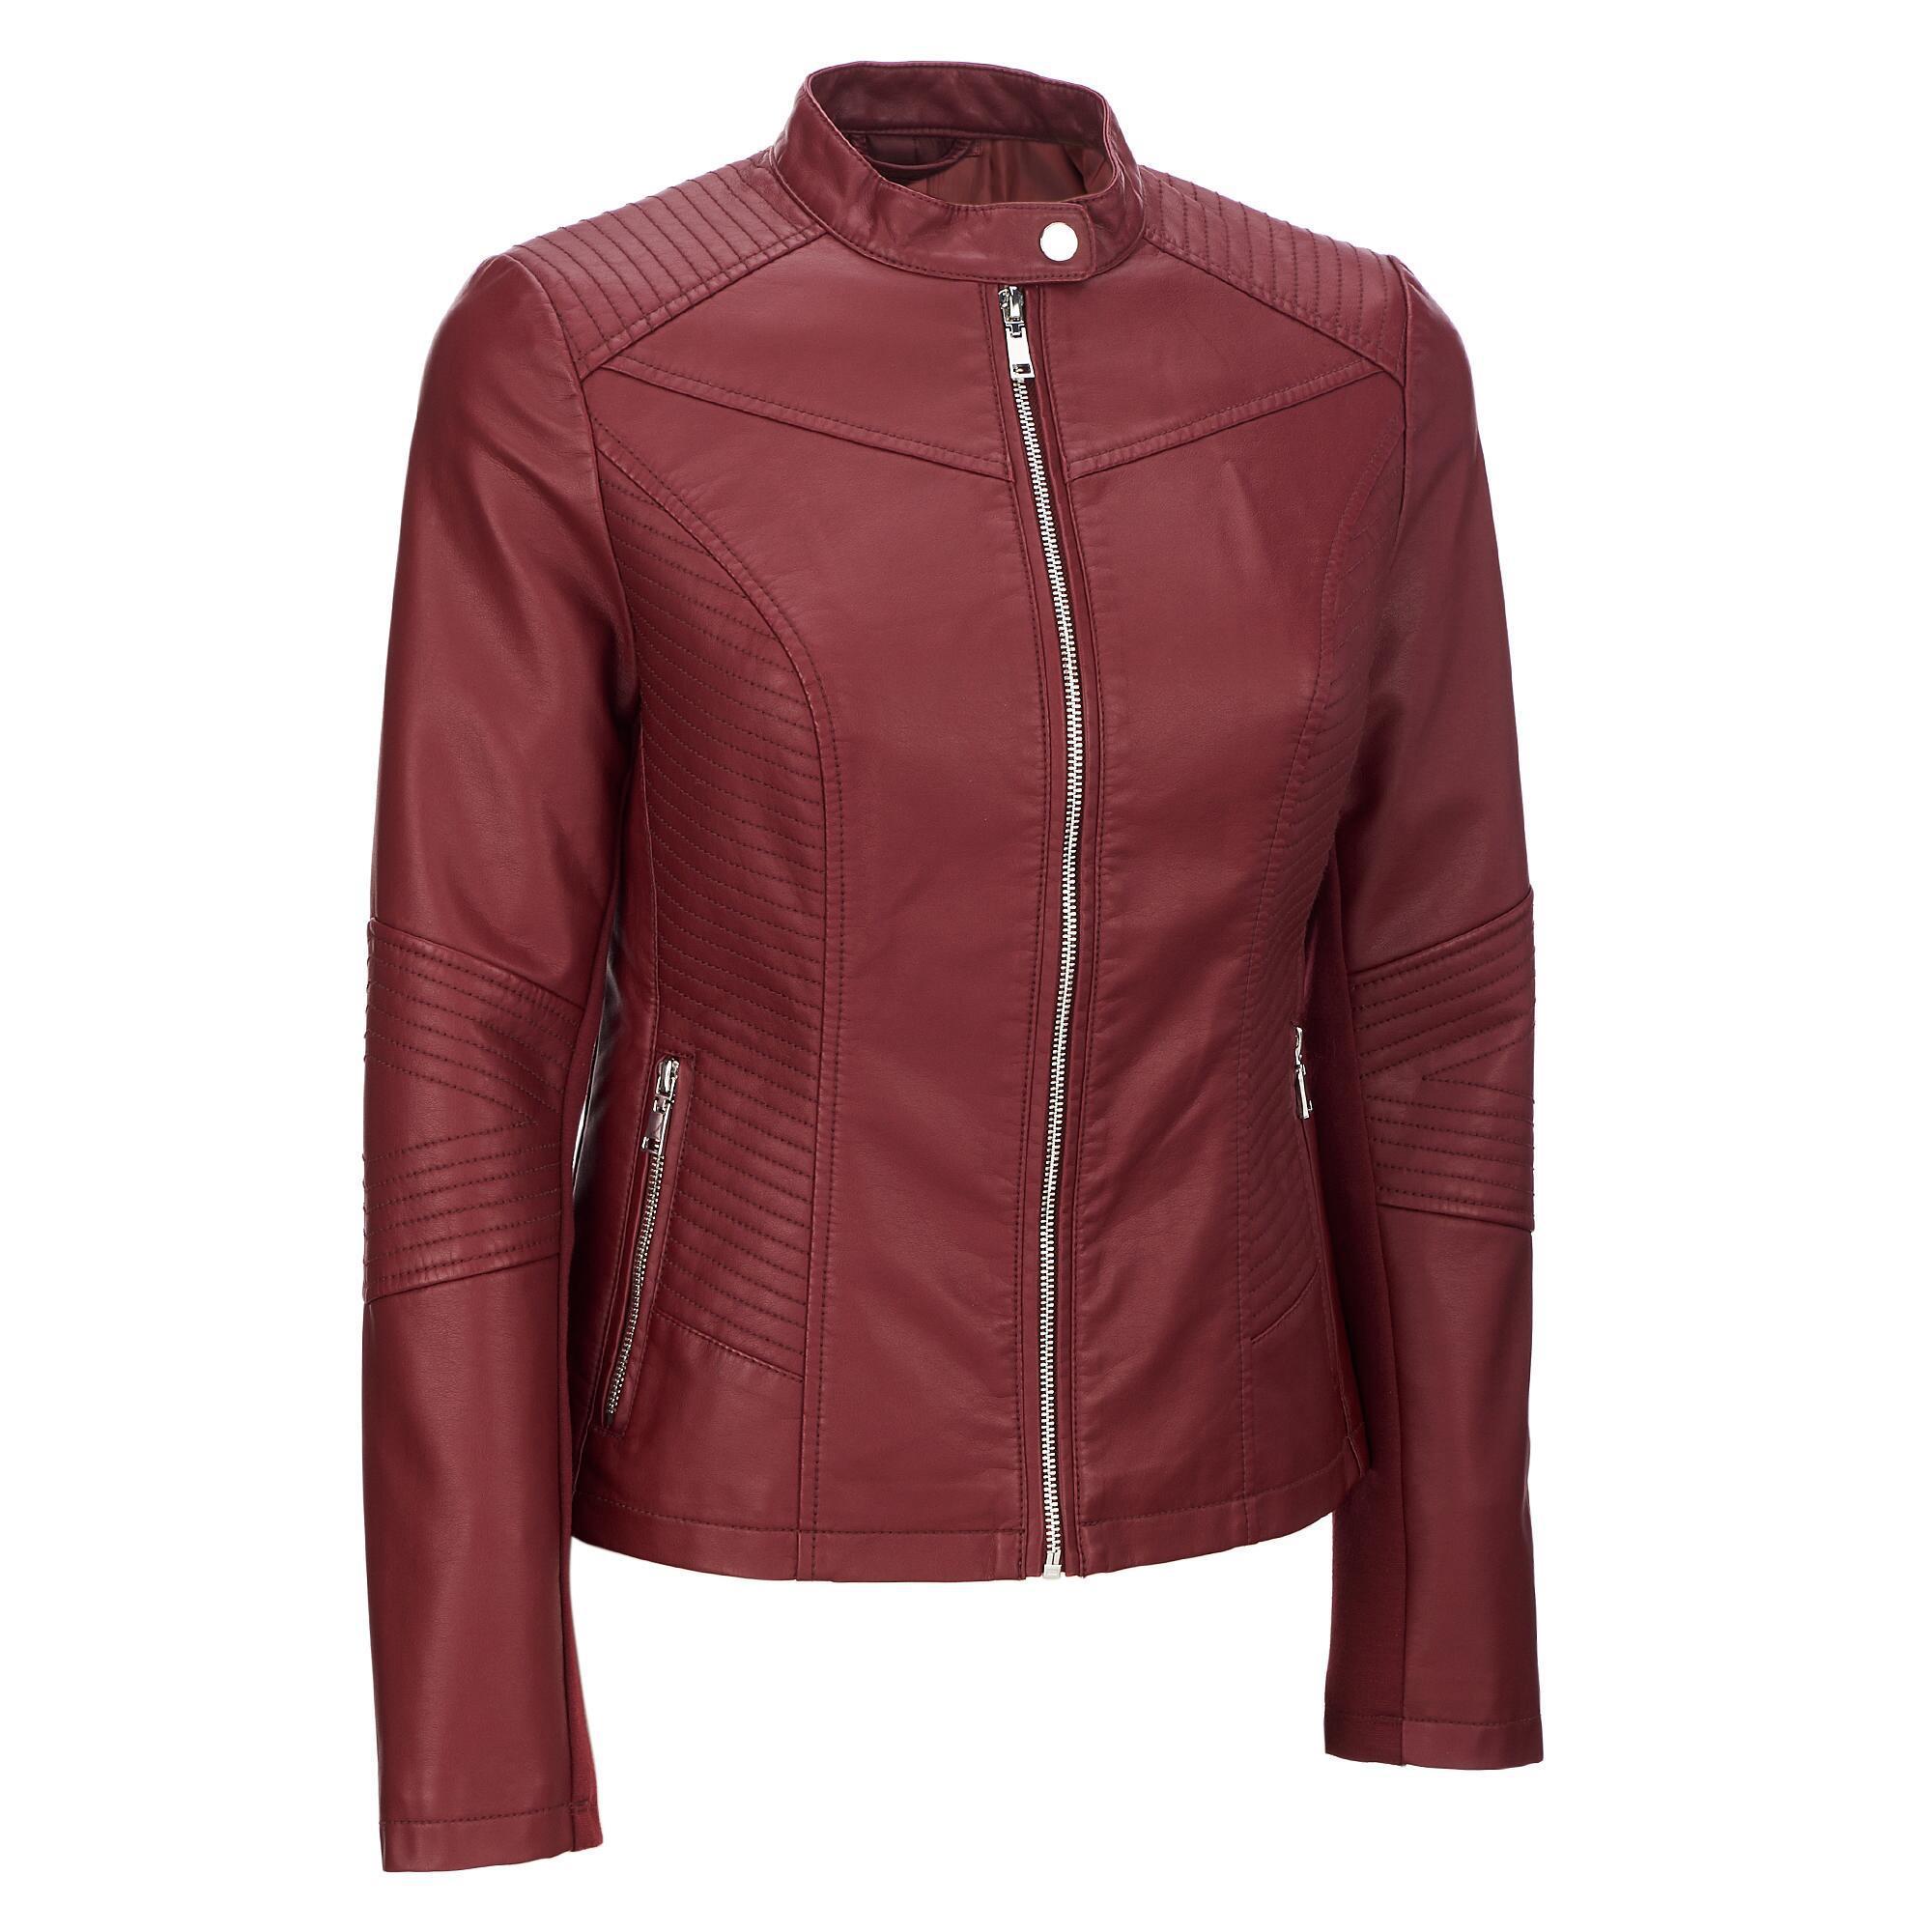 683bdb1f5c7 ... Plus Size Black Rivet Moto Mock Collar Faux-leather Jacket -. View  fullscreen